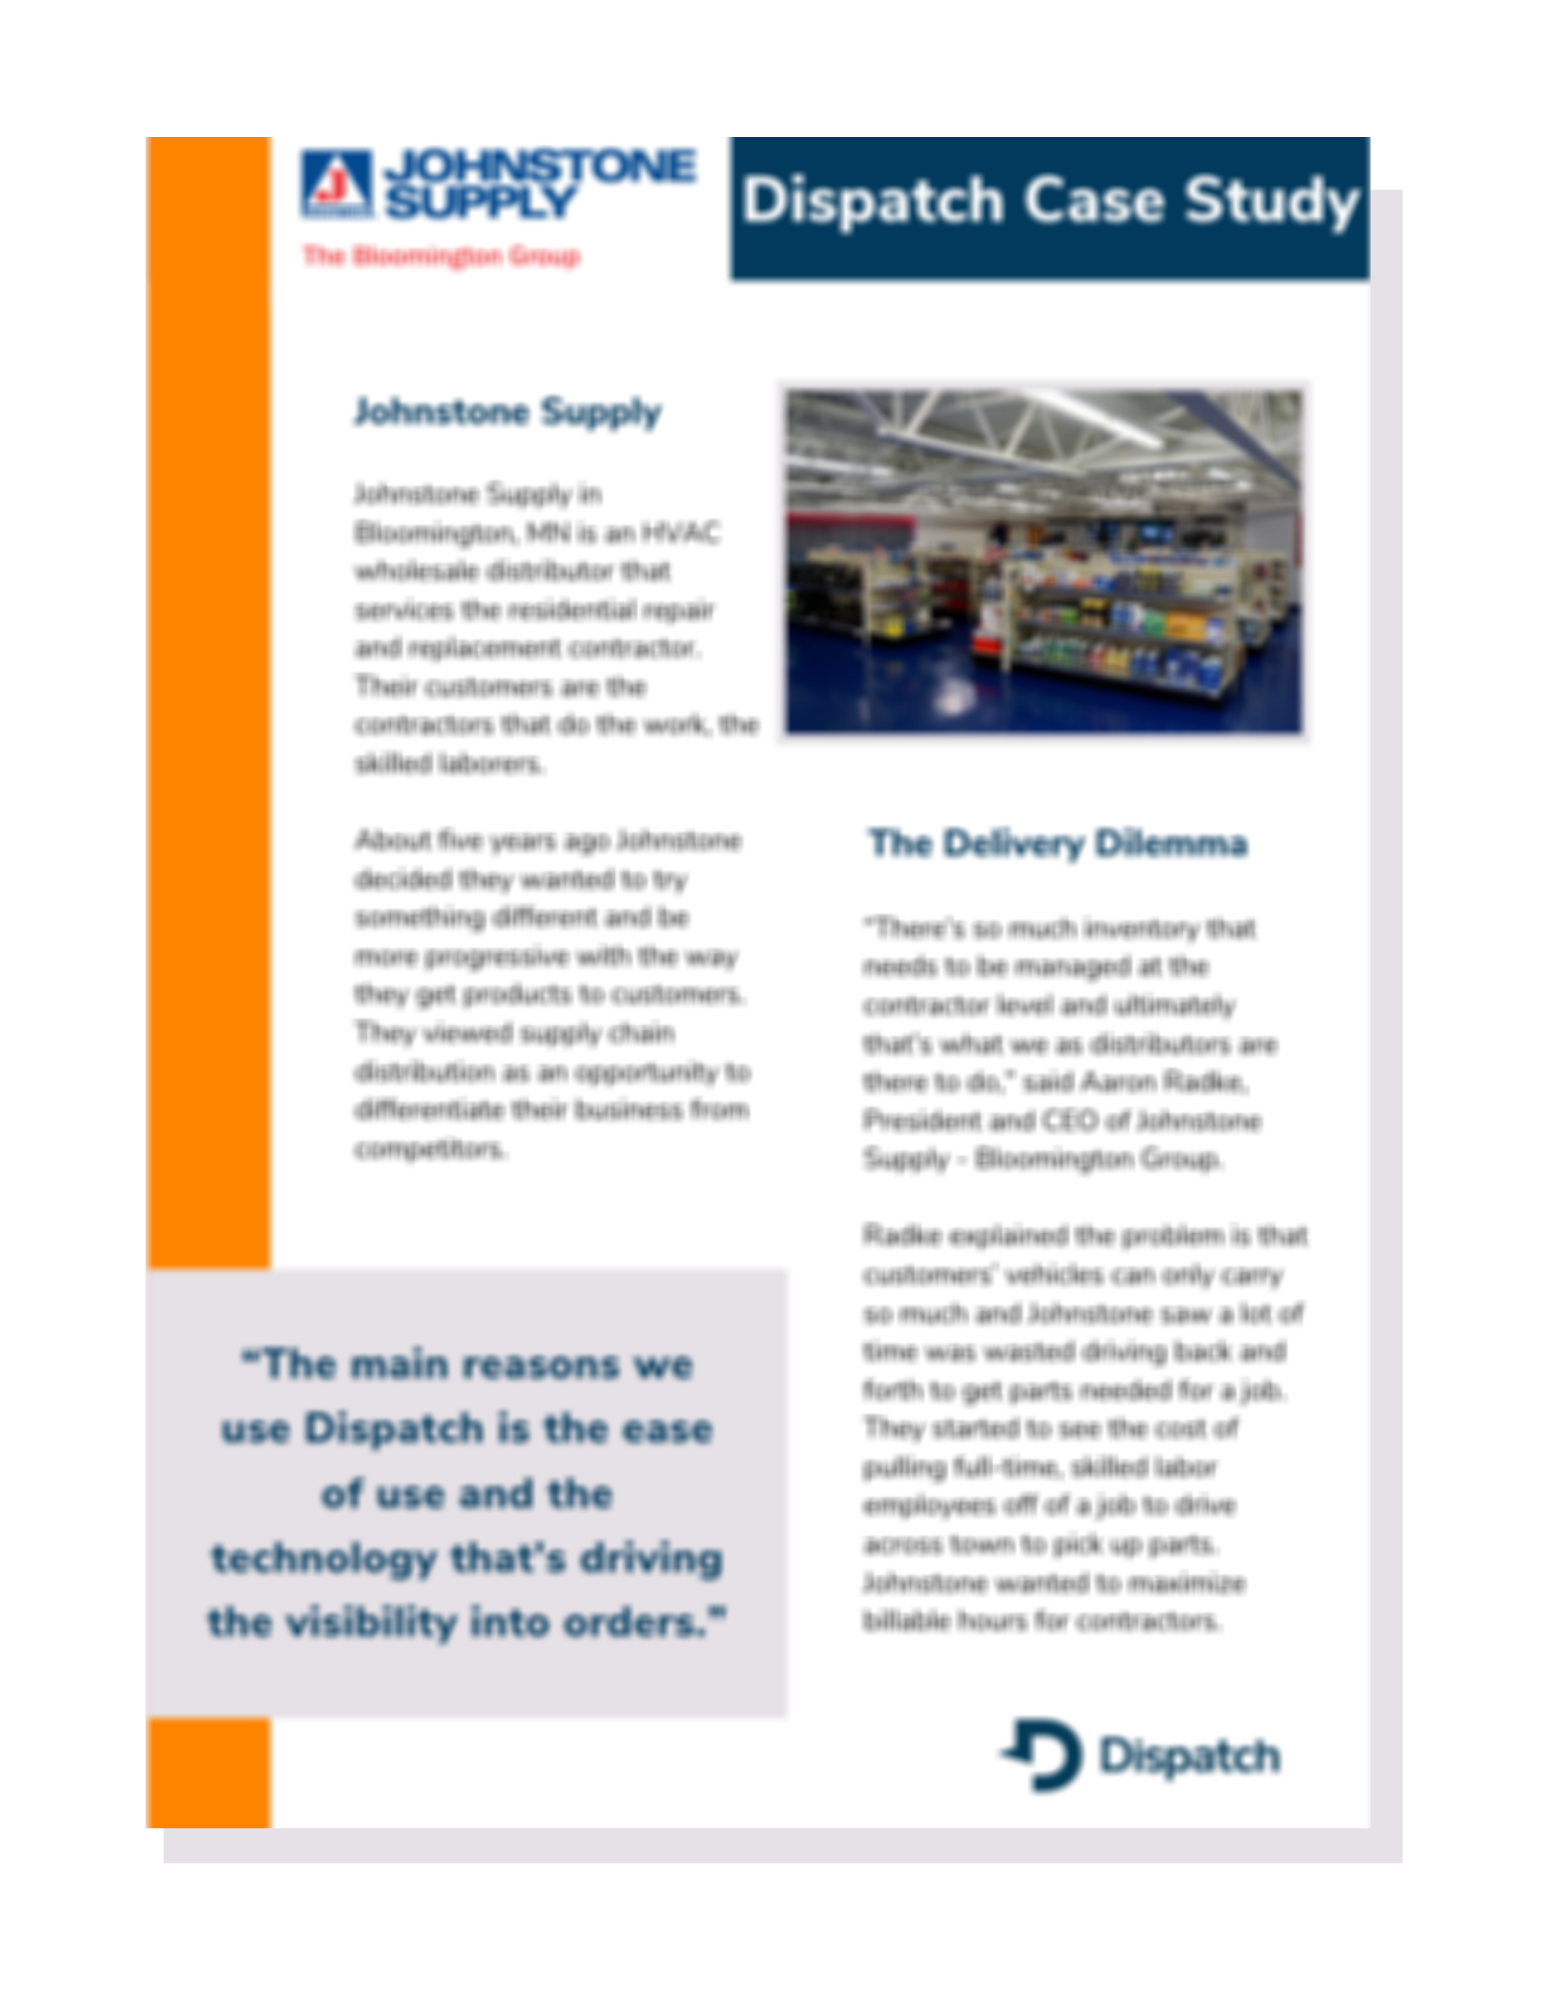 Johnstone Supply Case Study